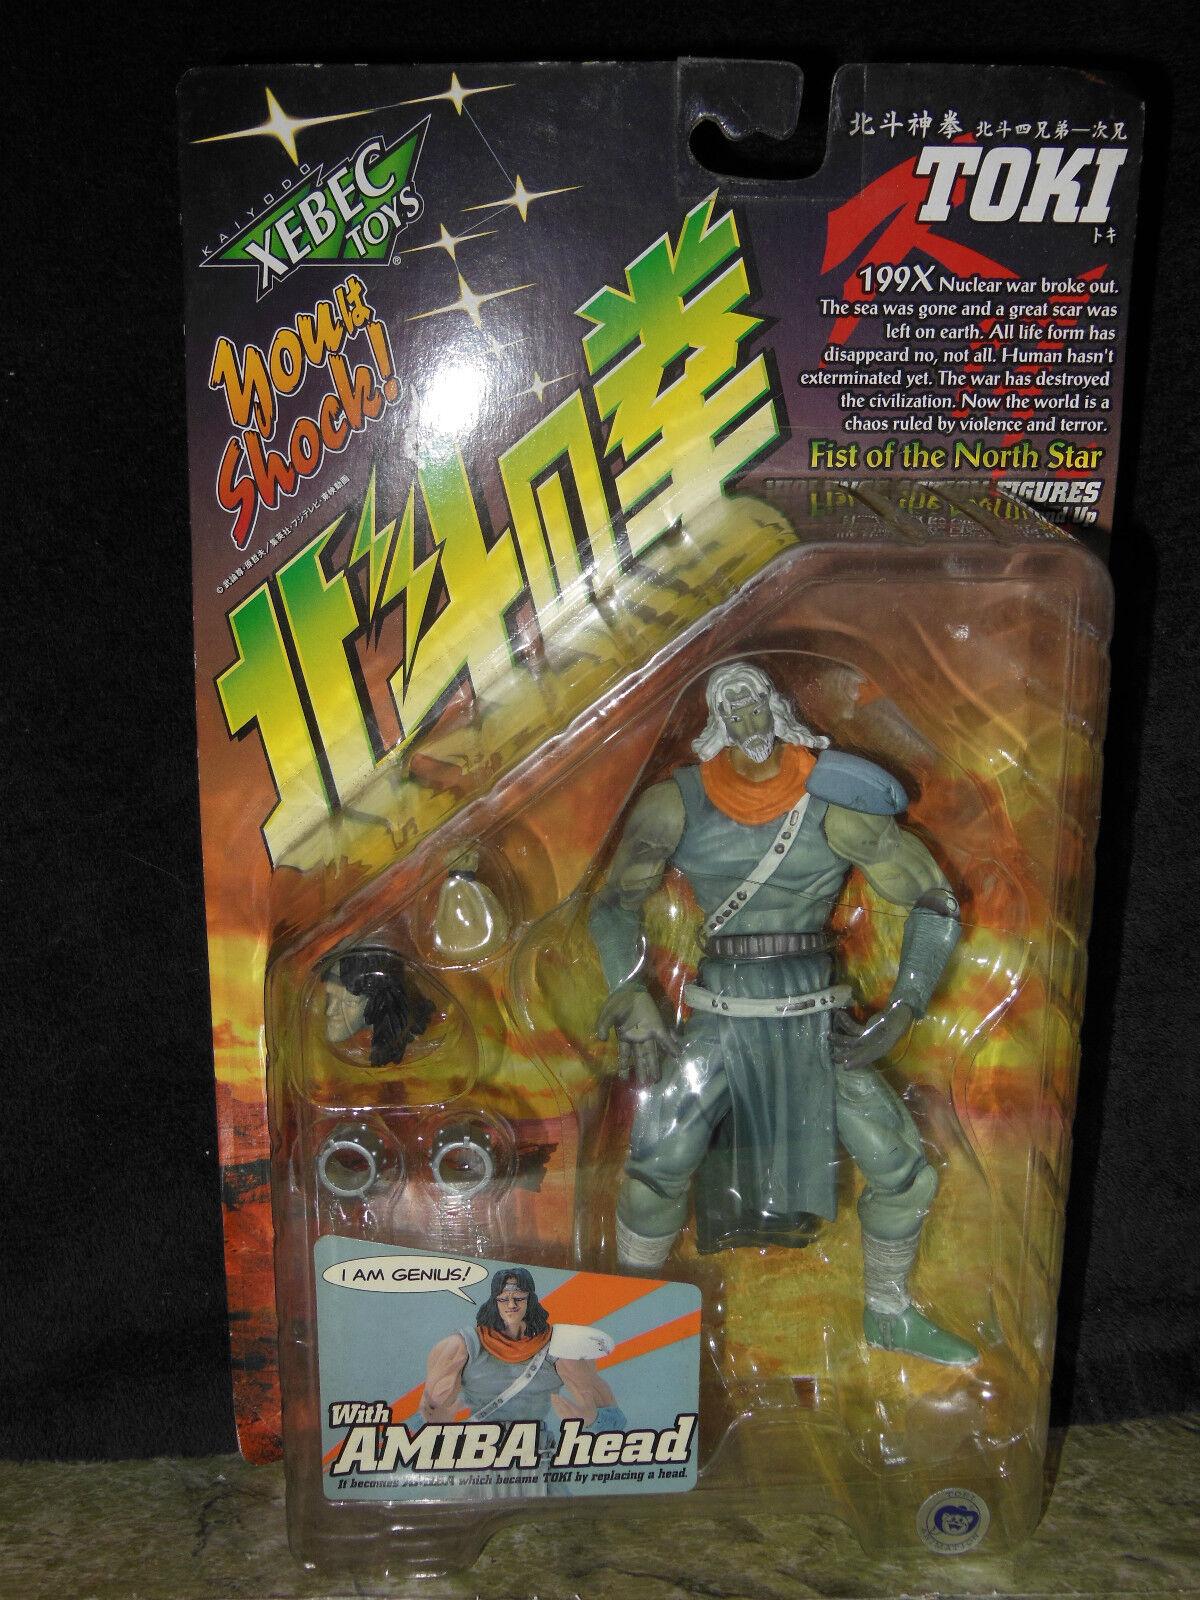 XEBEC Toys Fist of the North Star Tok w Amiba Head